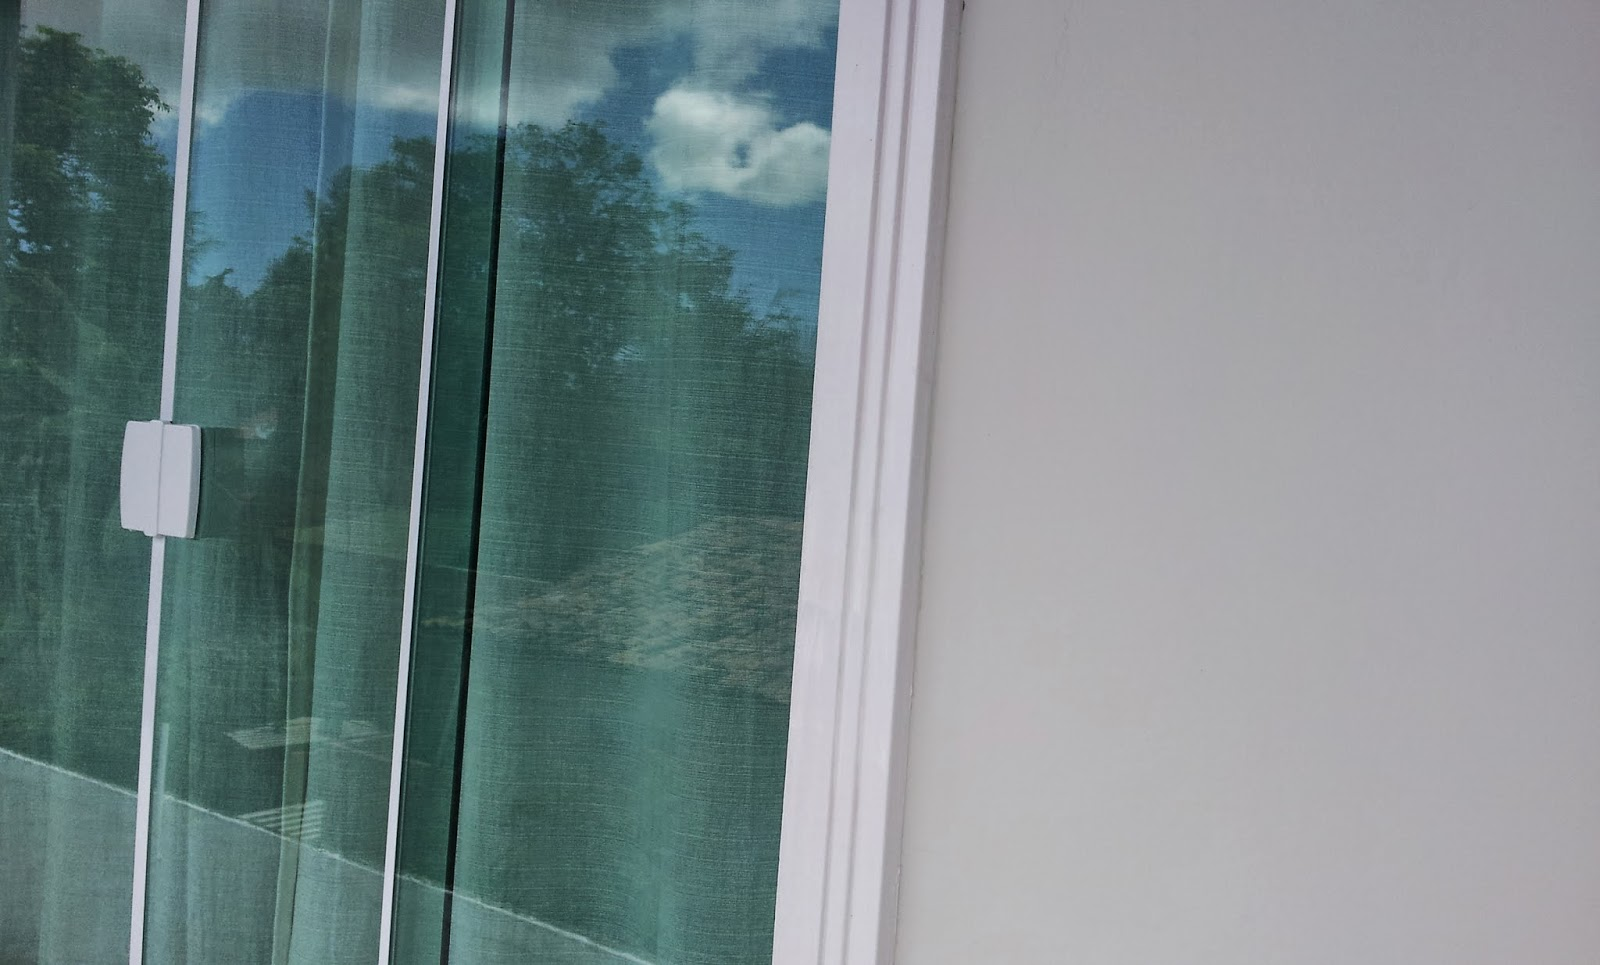 #365359  VIDRAÇARIA : JANELA E PORTA M 2000 DE VIDRO TEMPERADO EM FORTALEZA 414 Janelas De Vidros Em Fortaleza